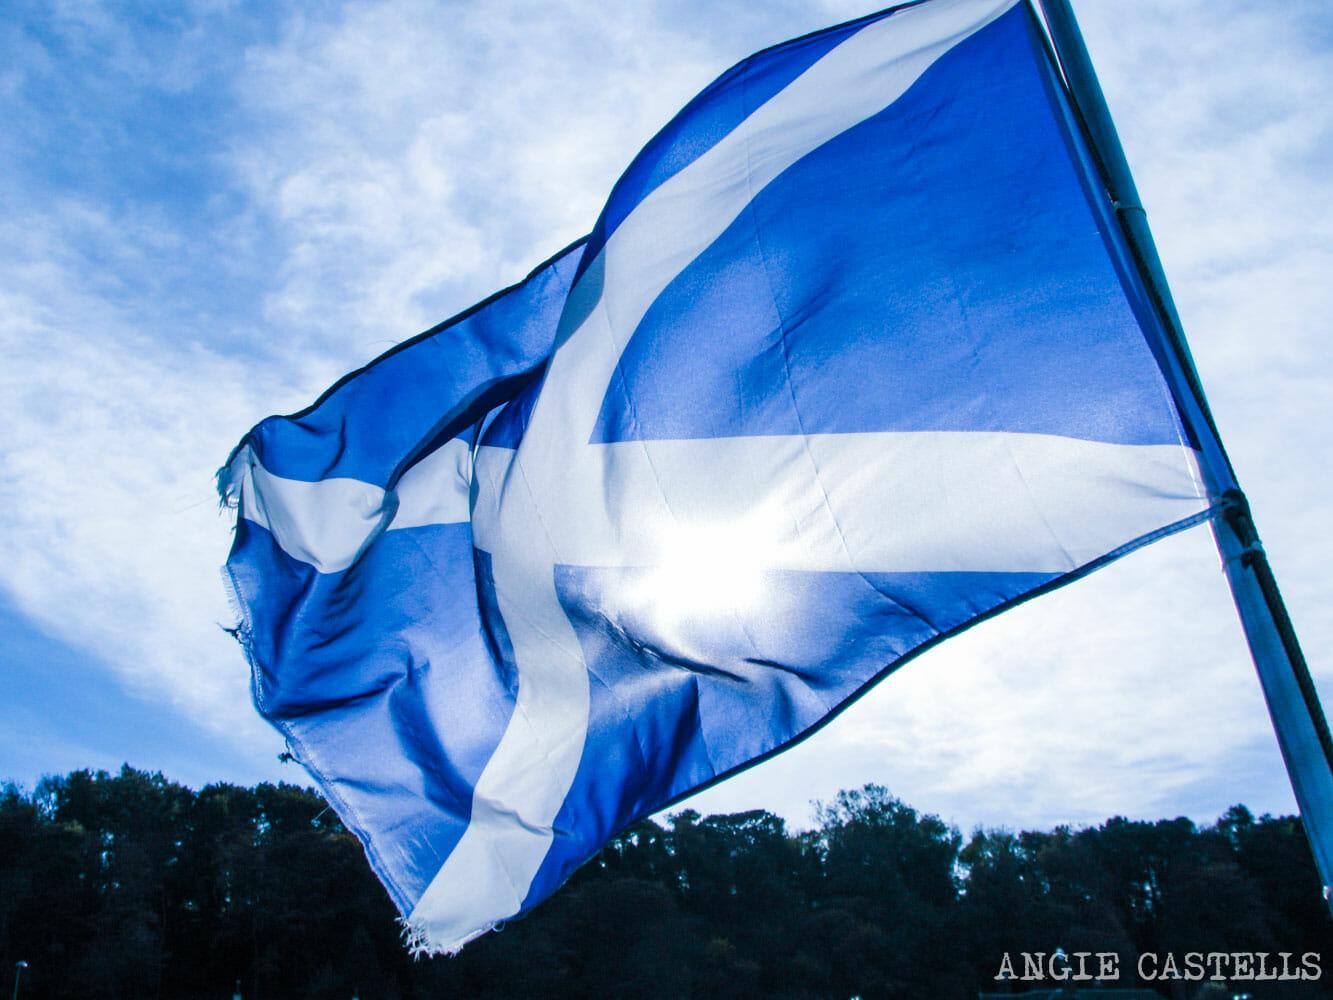 St-Andrews-Day-Dia-Nacional-Escocia-Bandera-escocesa